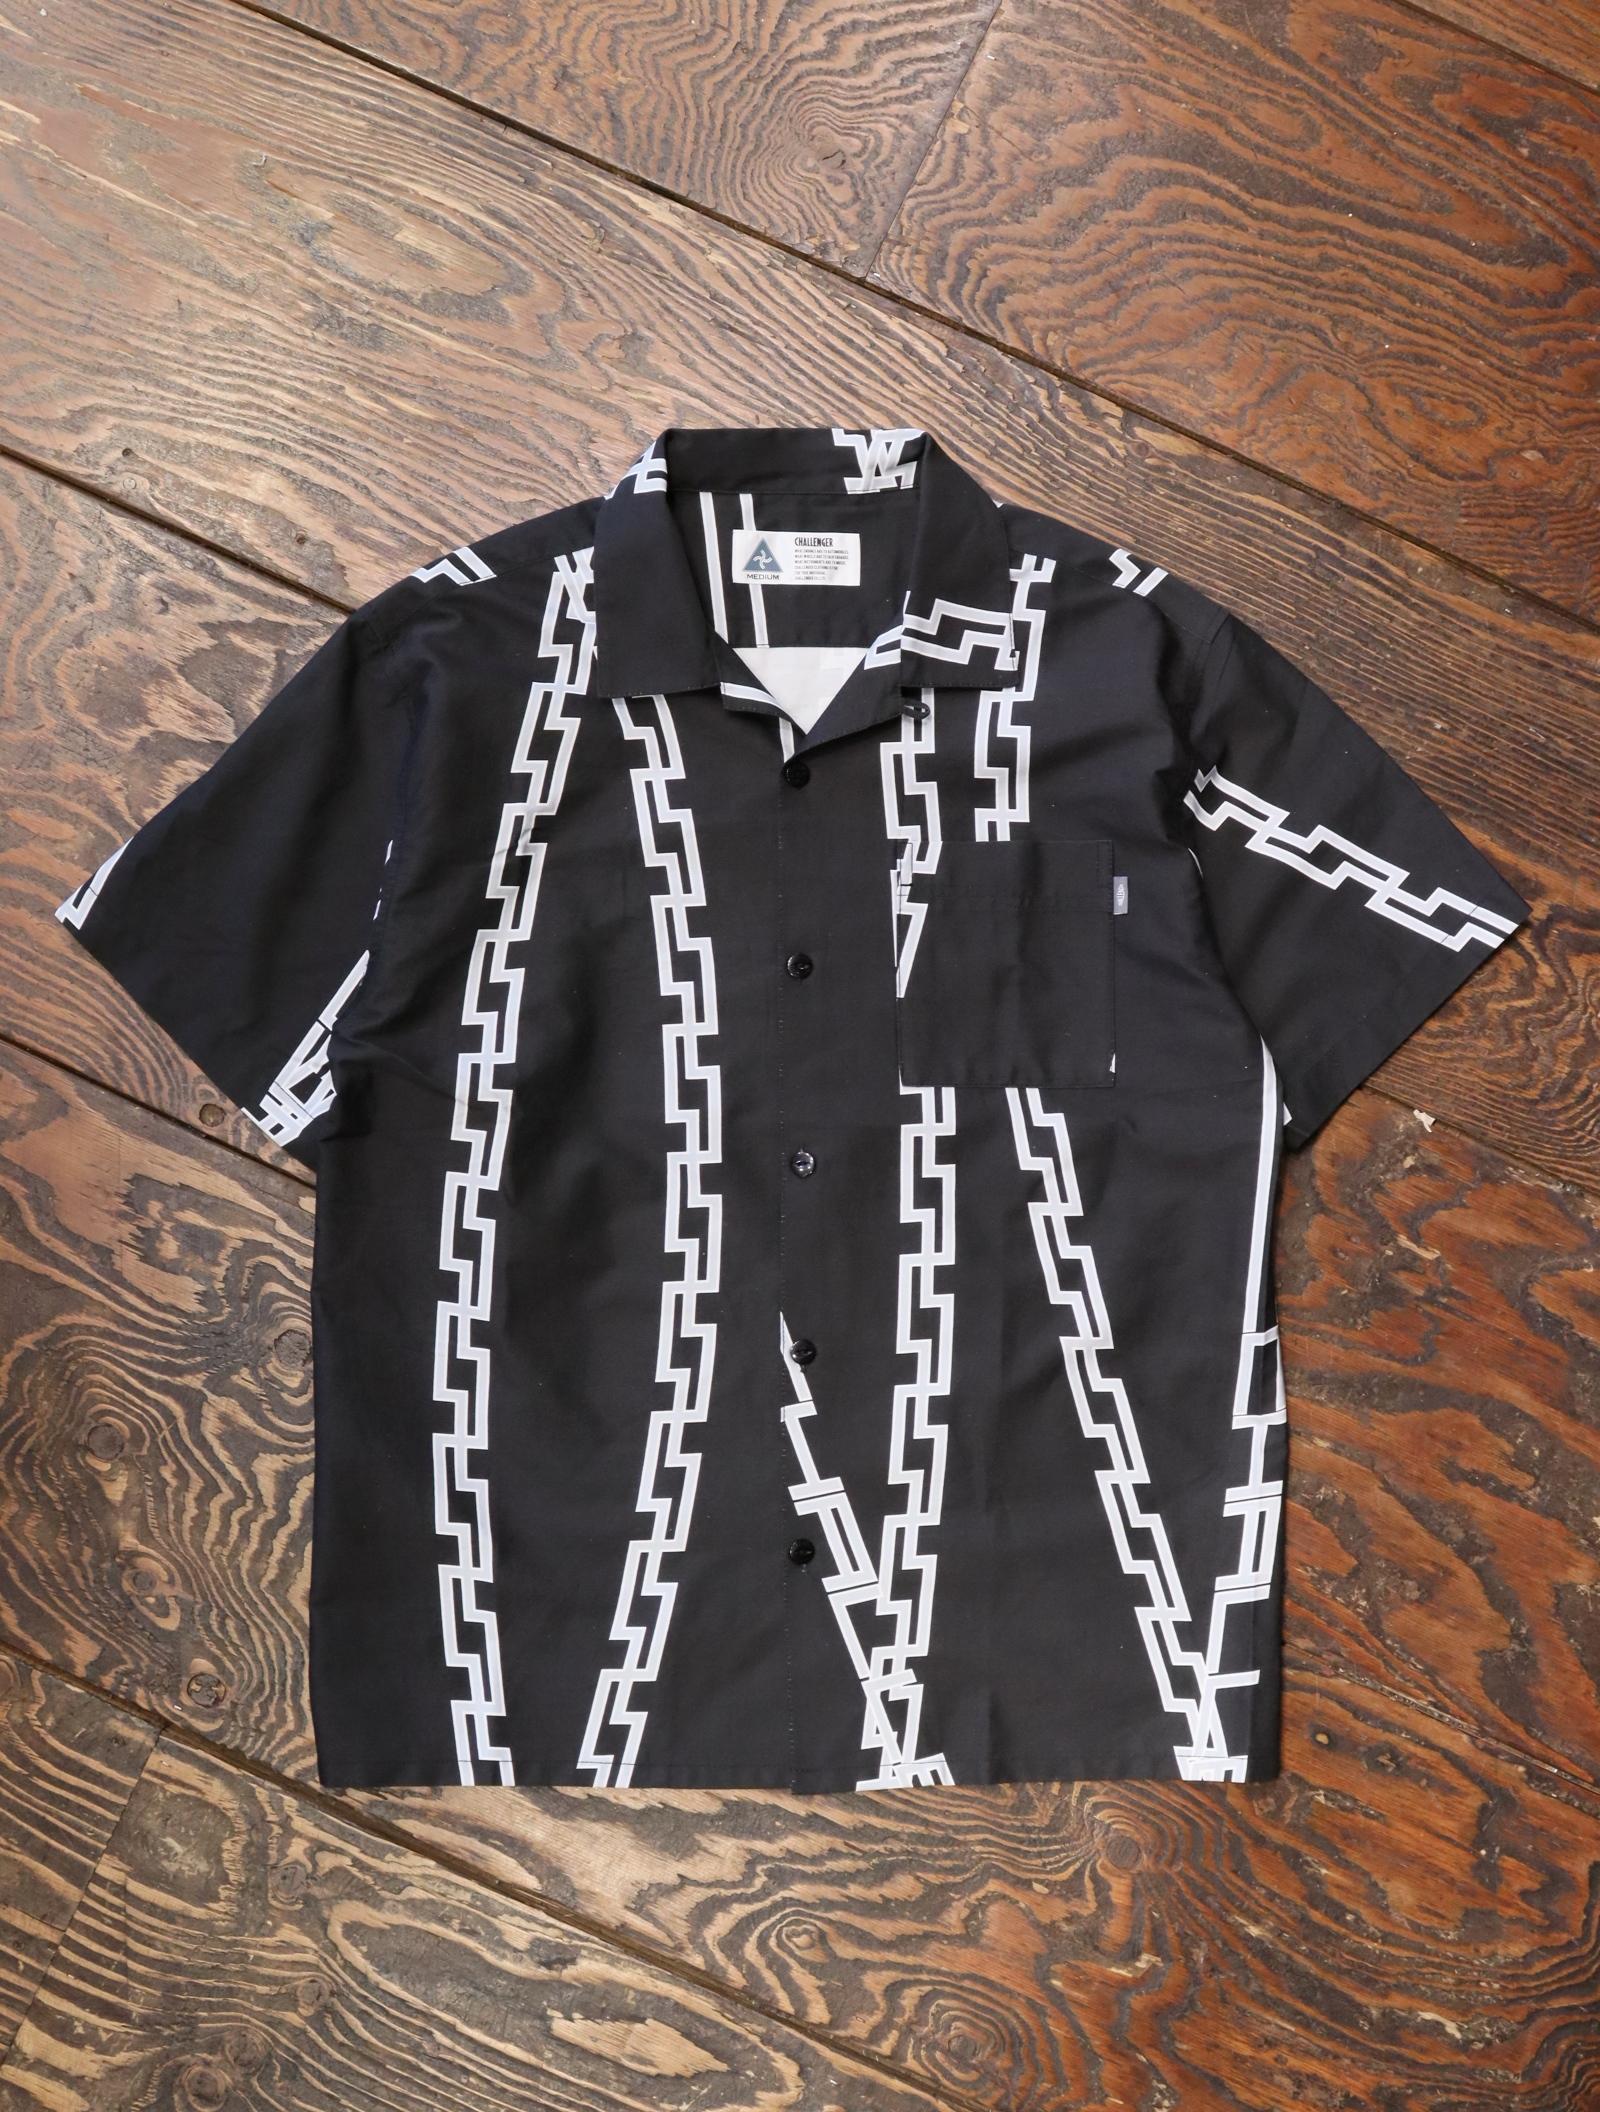 CHALLENGER  「S/S CHAIN SHIRT」  オープンカラーシャツ